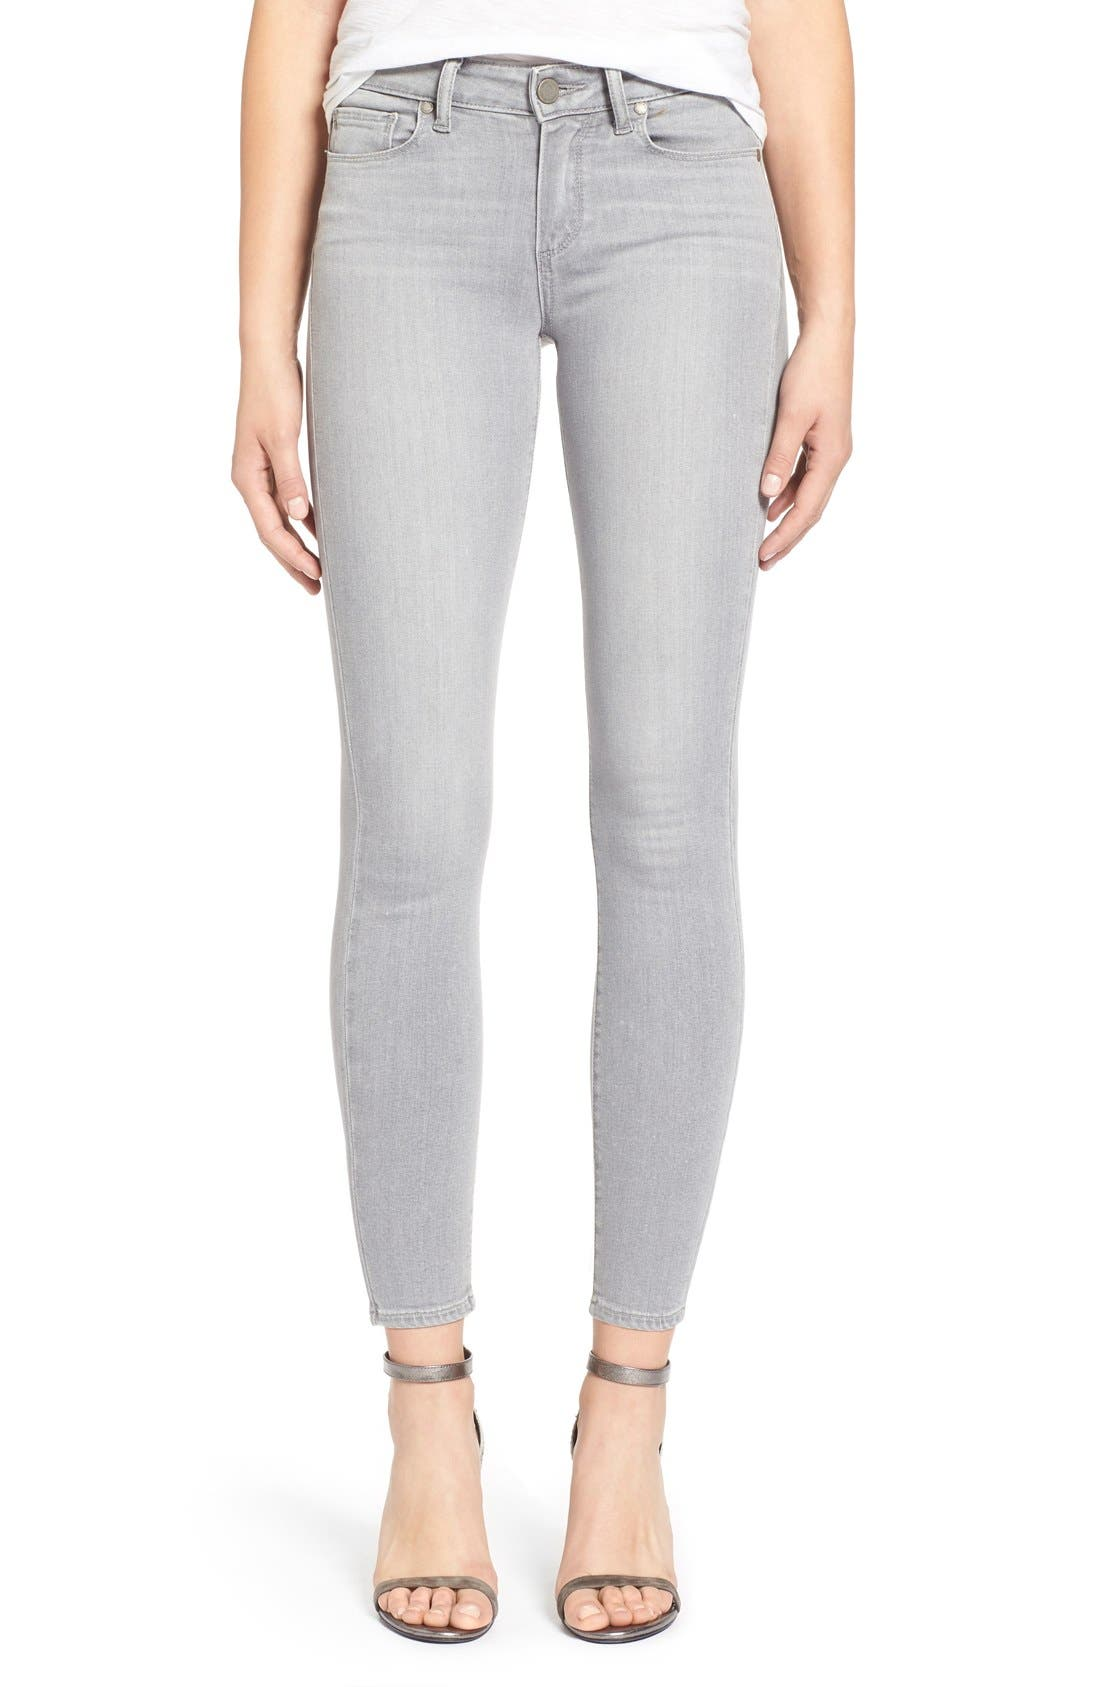 Main Image - Paige Denim 'Verdugo' Ankle Skinny Jeans (Dove Grey)